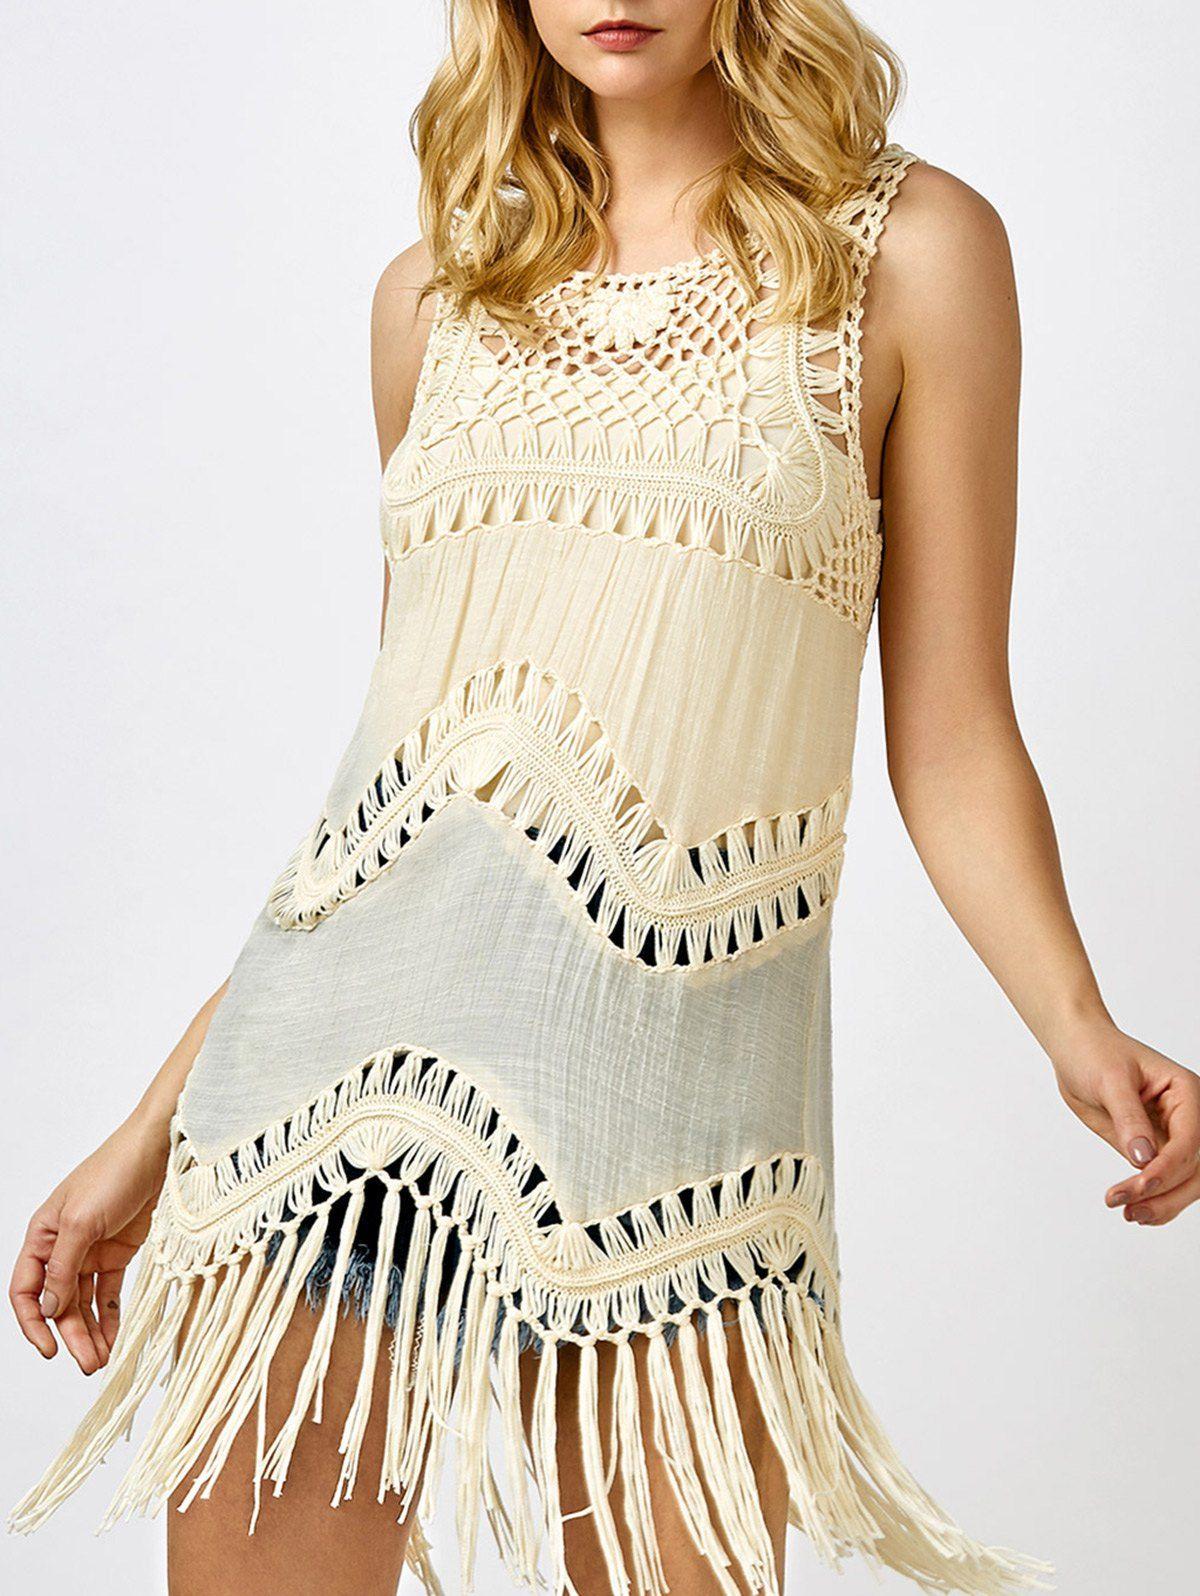 57038a4ac2 Crochet Sleeveless T-Shirt with Tassel | Refashioning | Crochet t ...